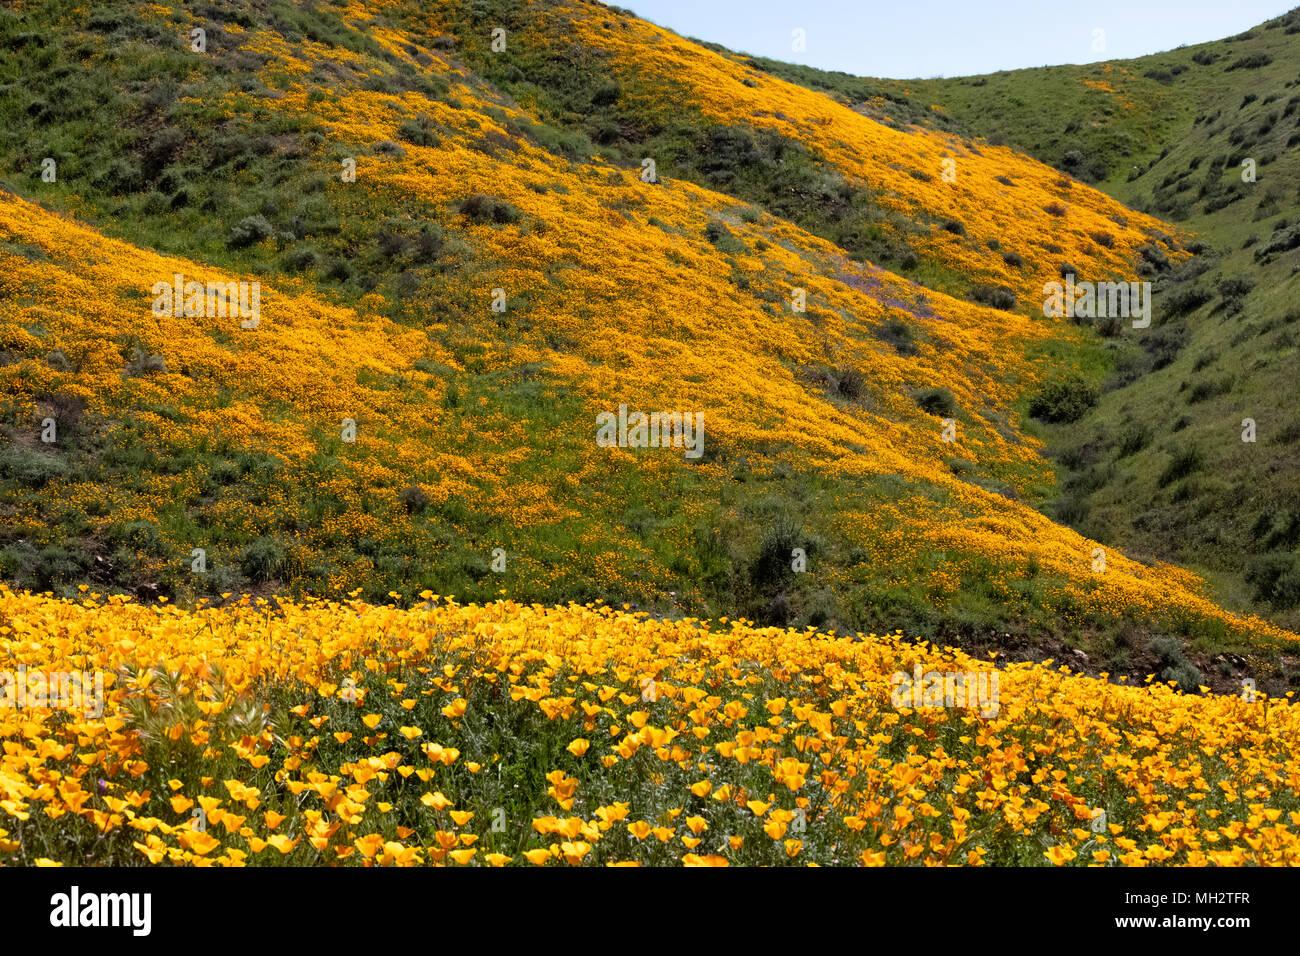 Wild flower super bloom in Walker Canyon California - Stock Image